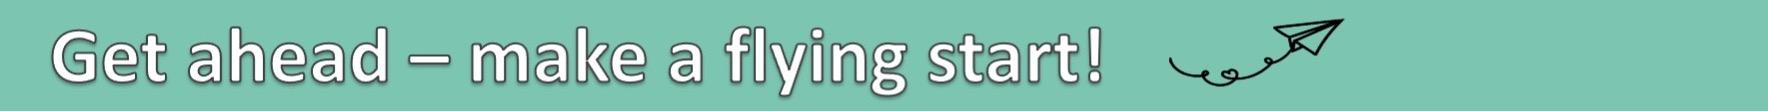 Get ahead - make a flying start banner